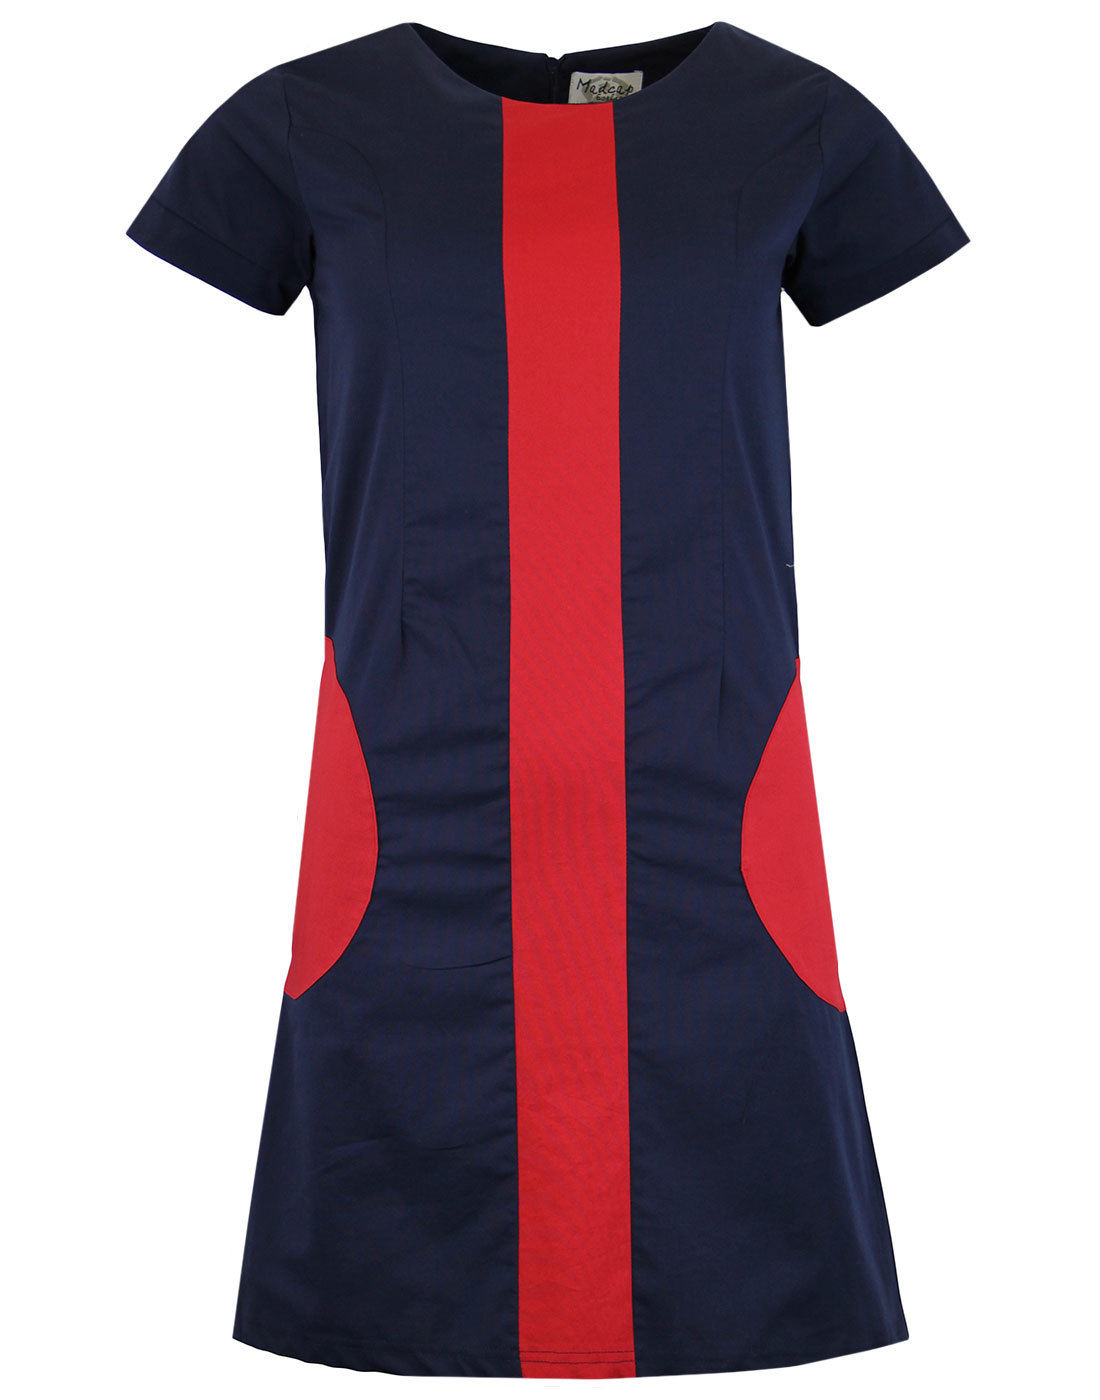 Honey MADCAP ENGLAND Mod Circle Pocket Dress NAVY